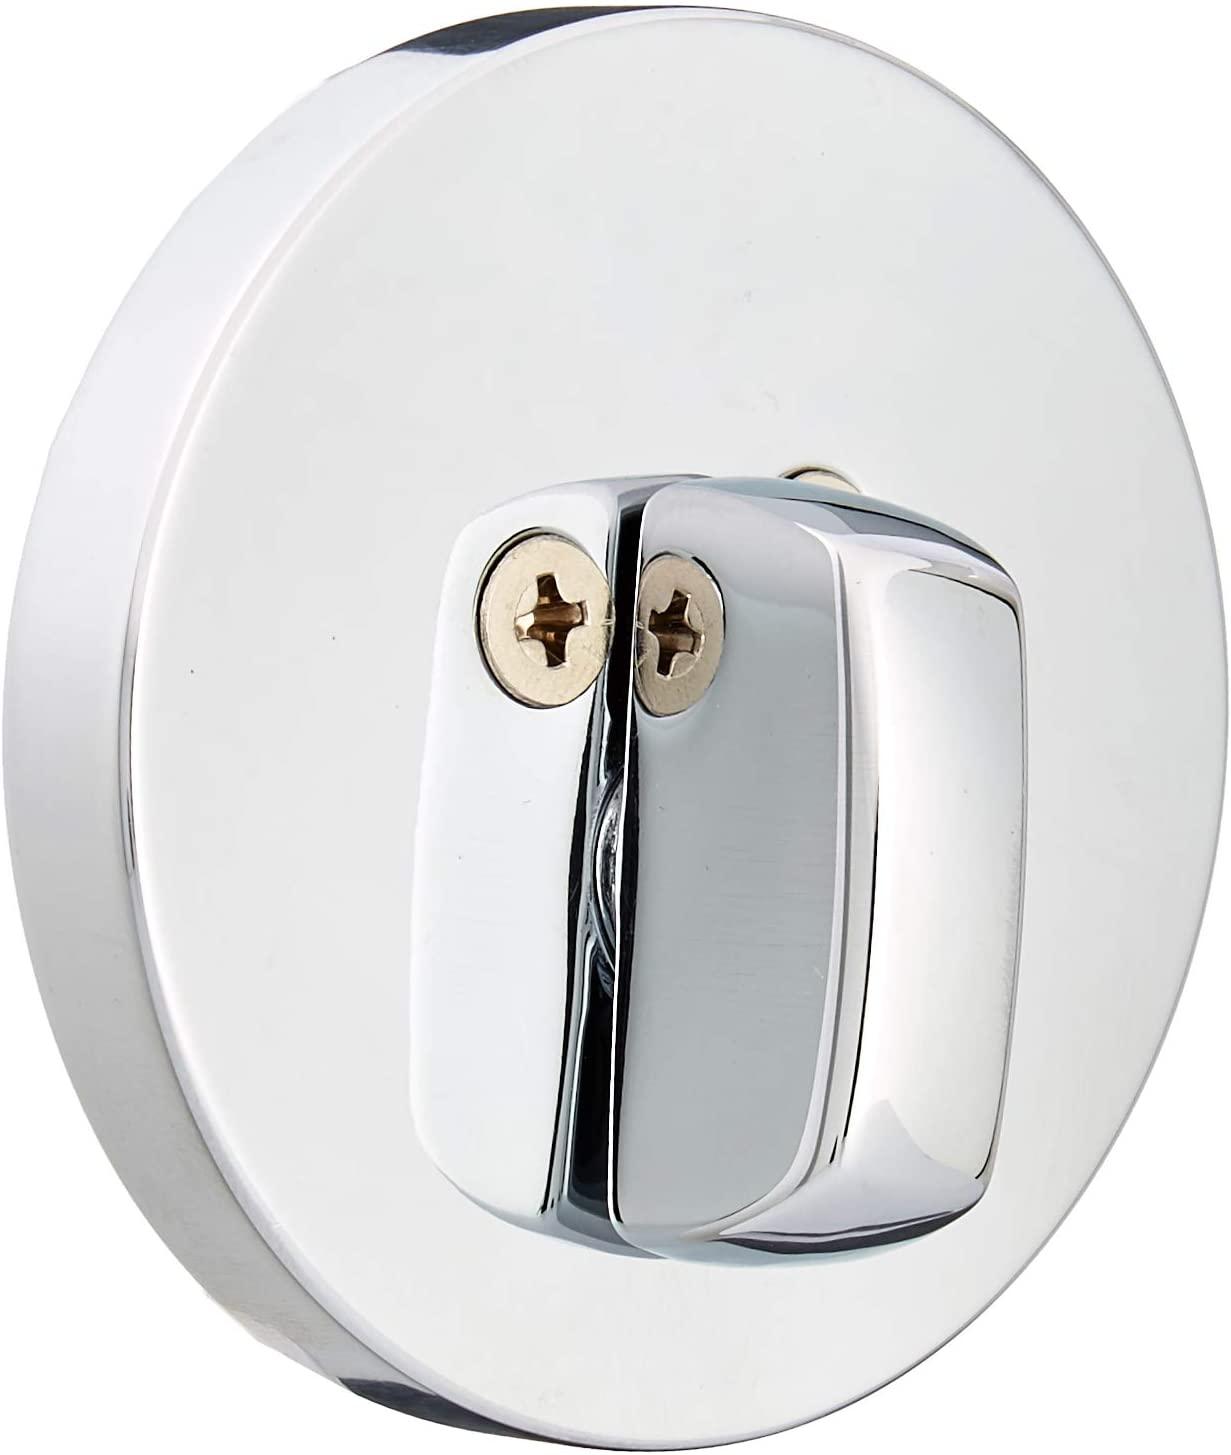 Baldwin Hardware 8244.260.PAT Deadbolt Lock